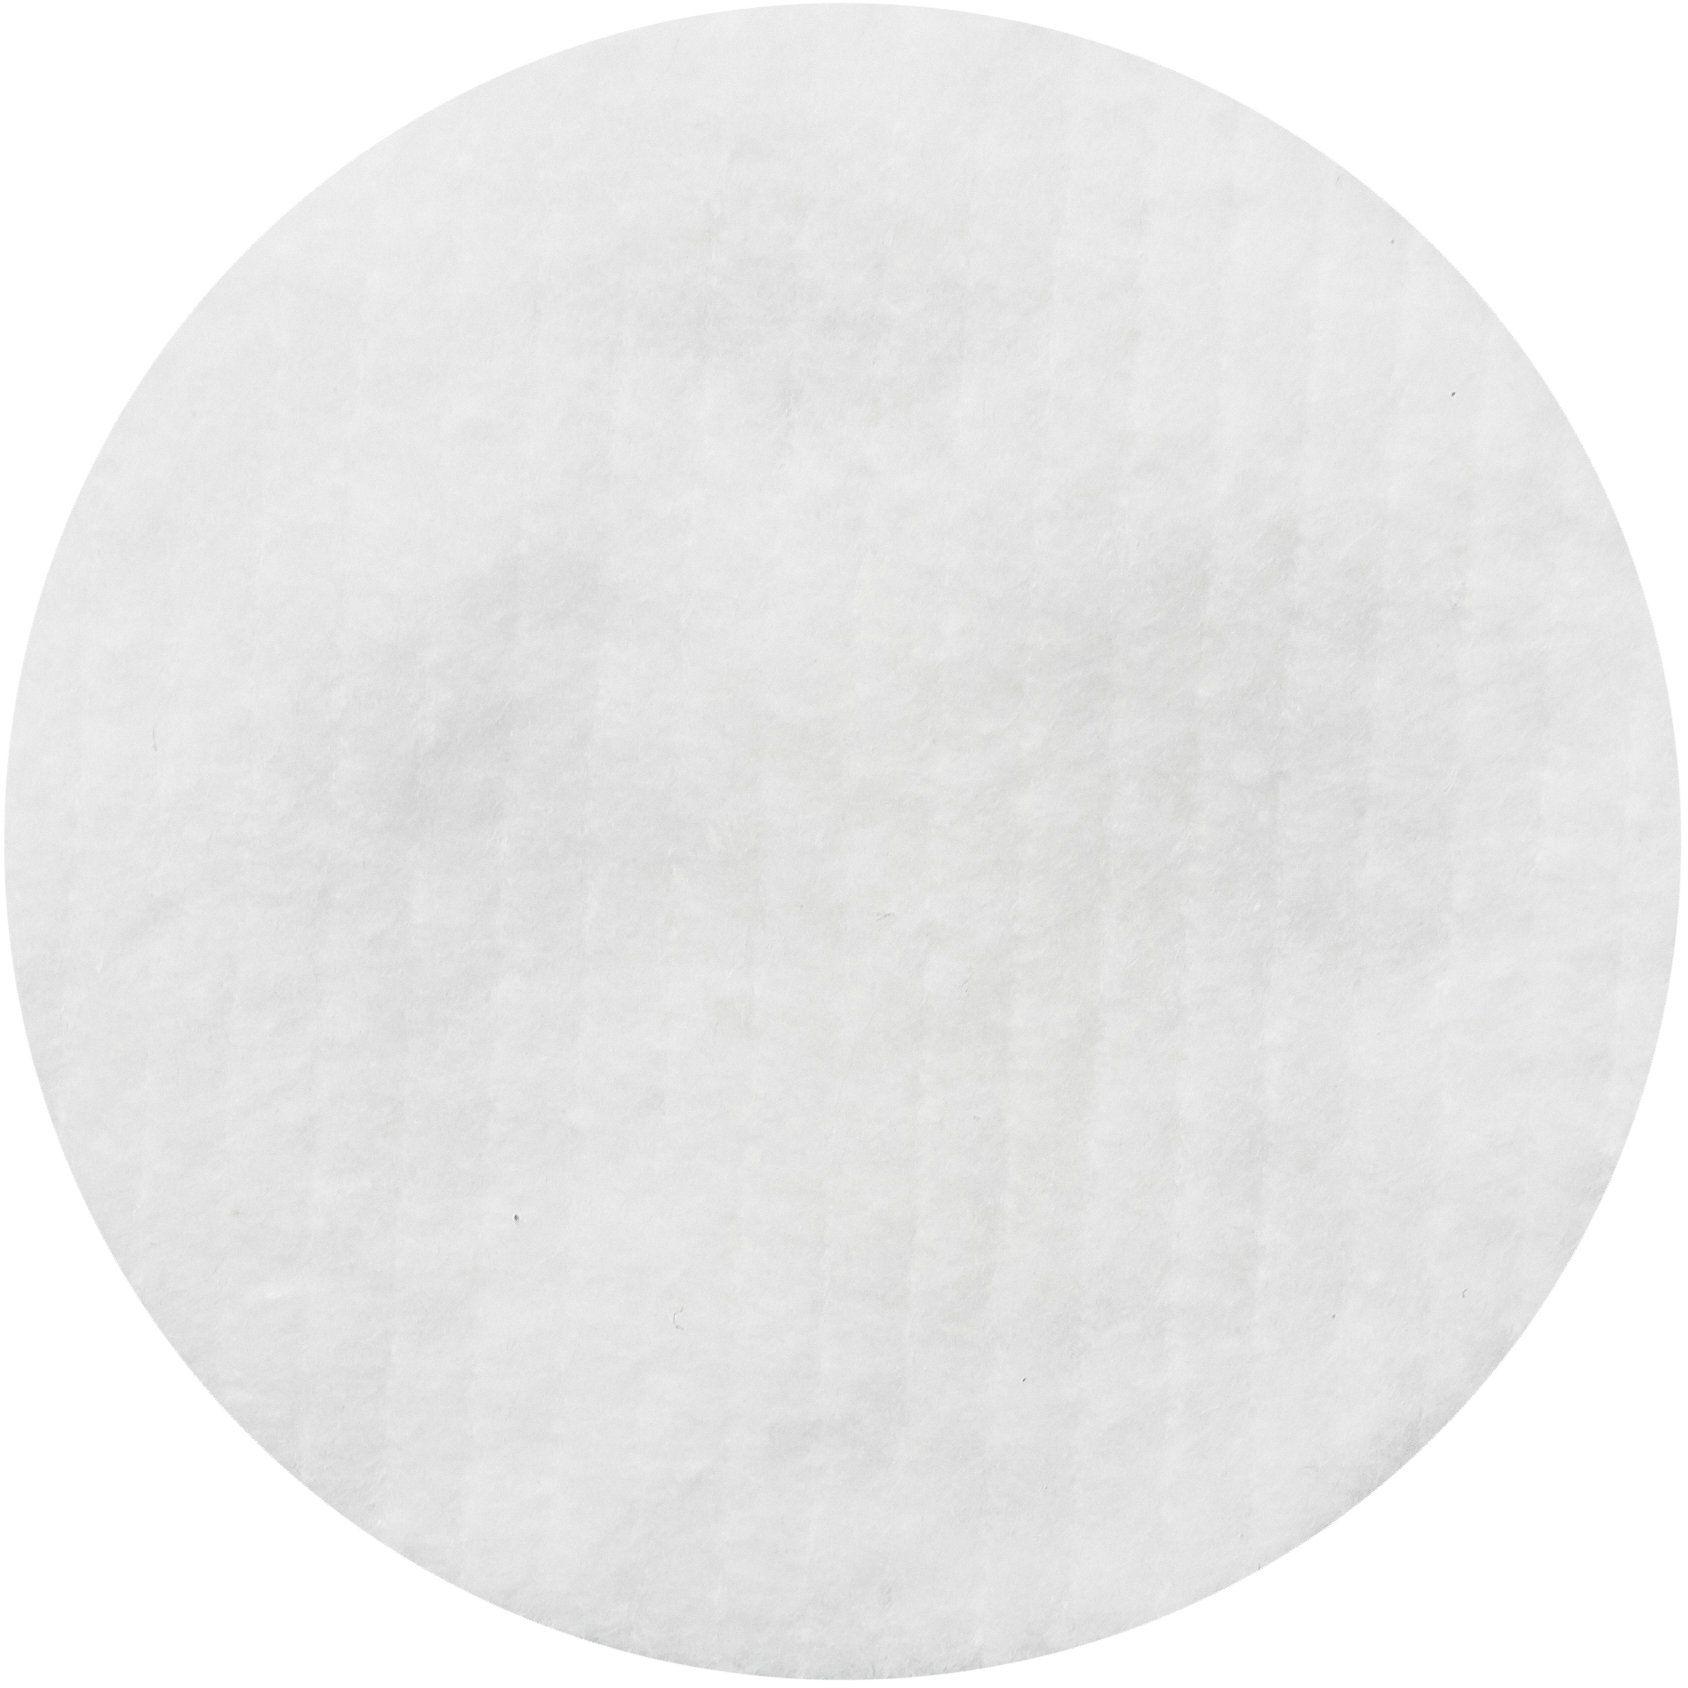 Waciki Fripac-Medis Fripac ze 100% bawełny, 60 mm średnicy, 500 sztuk